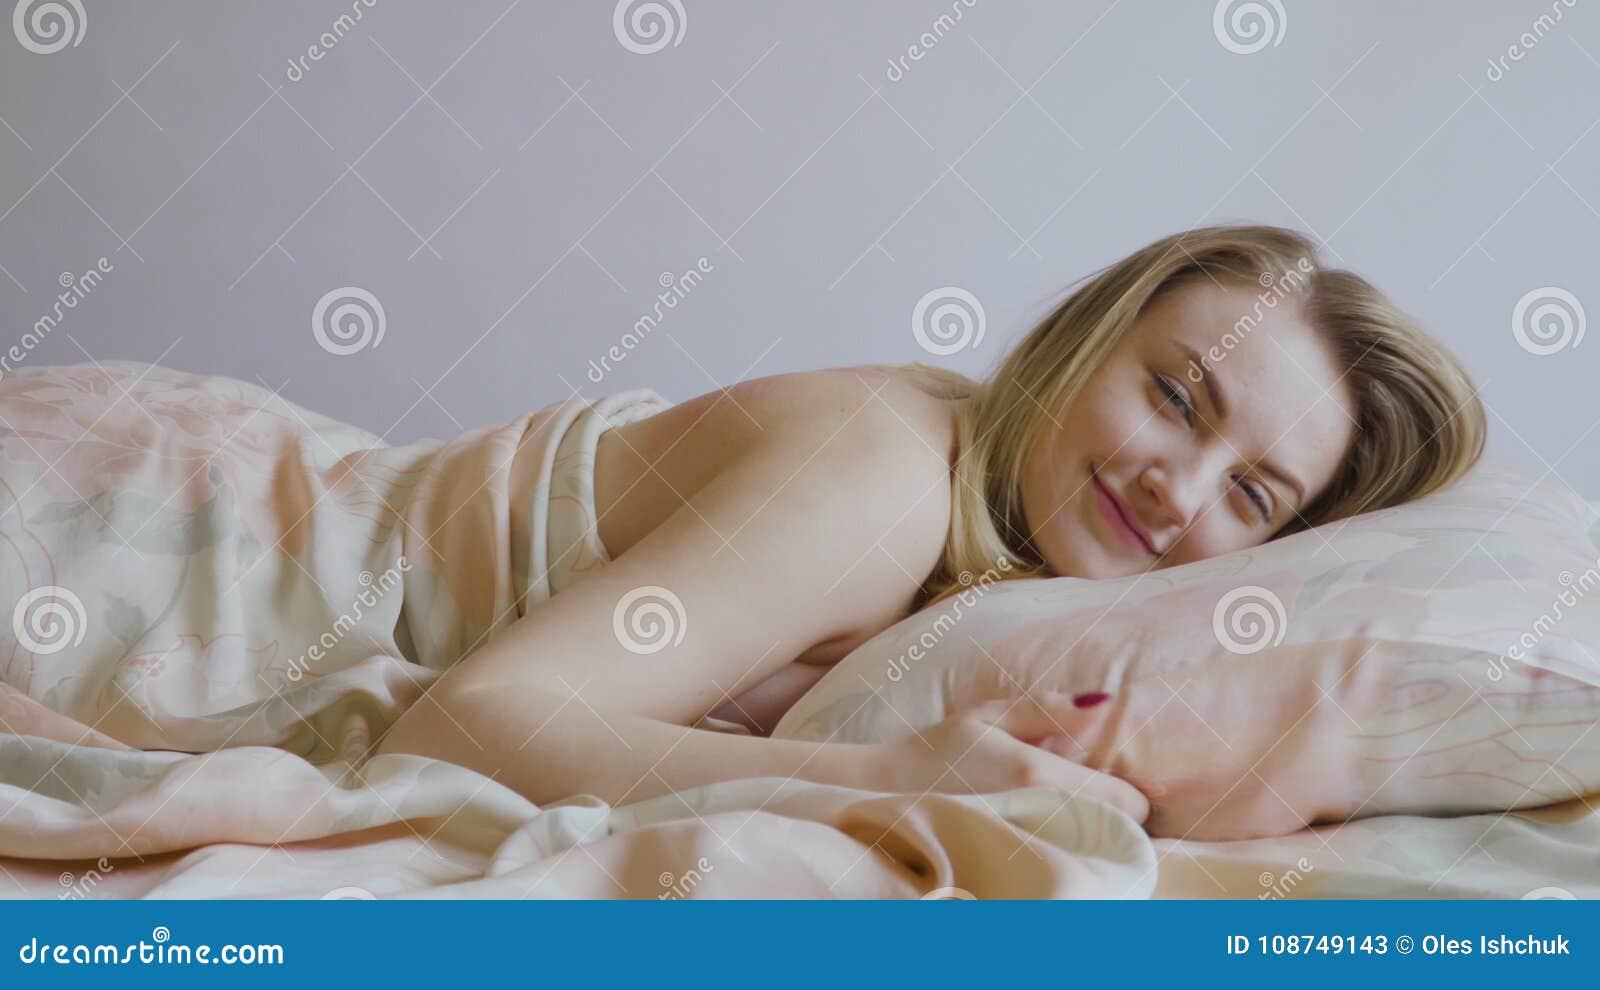 Girls sex full screen hd potos